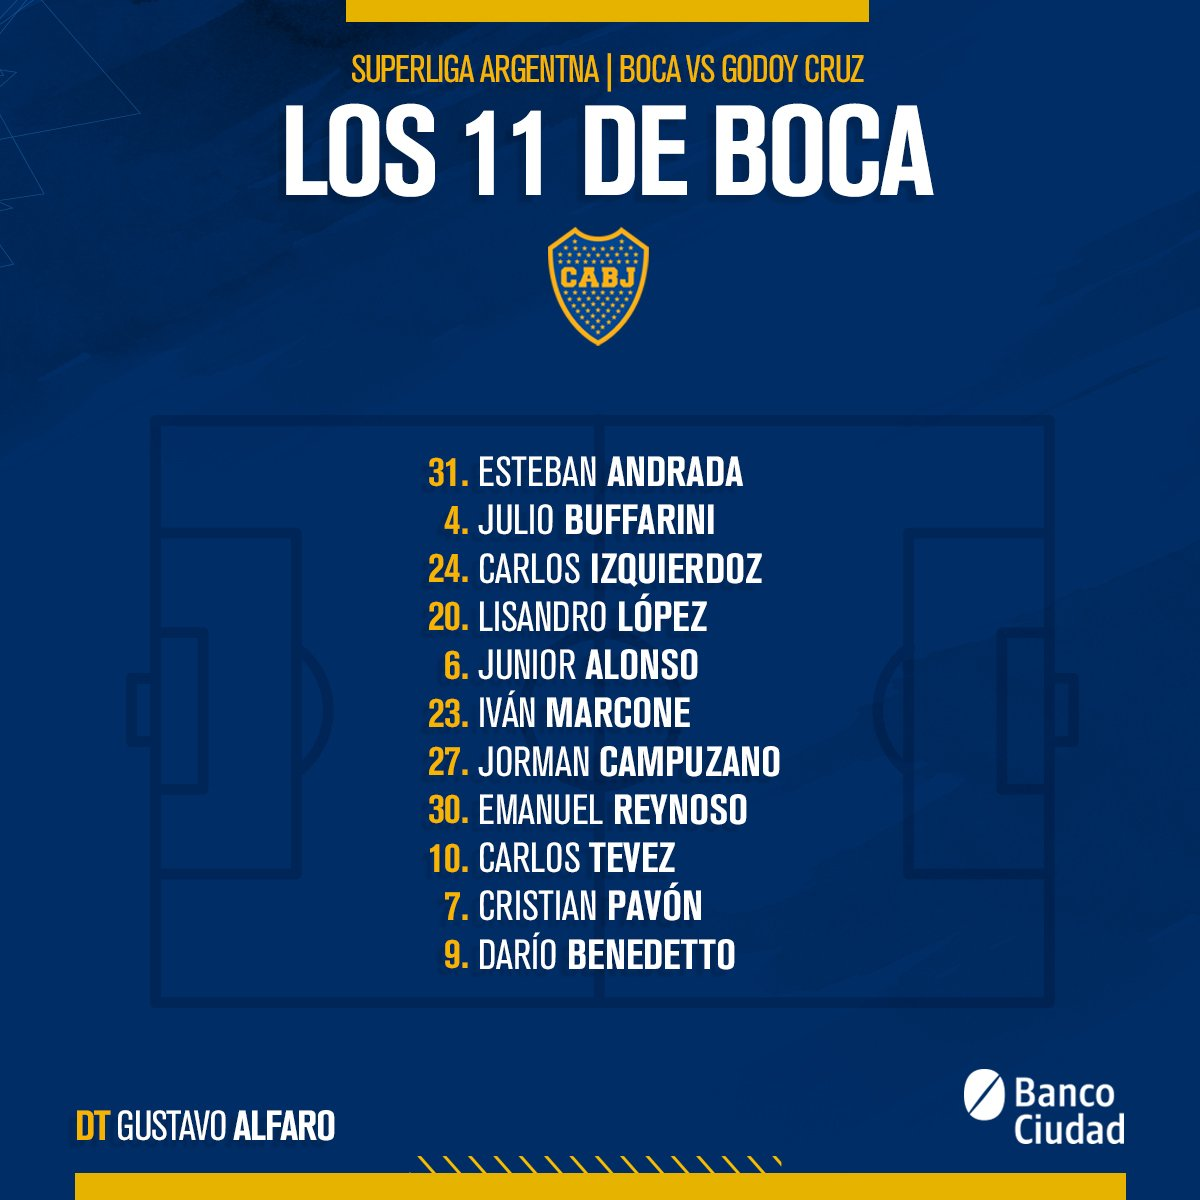 Boca Jrs. Oficial's photo on Benedetto